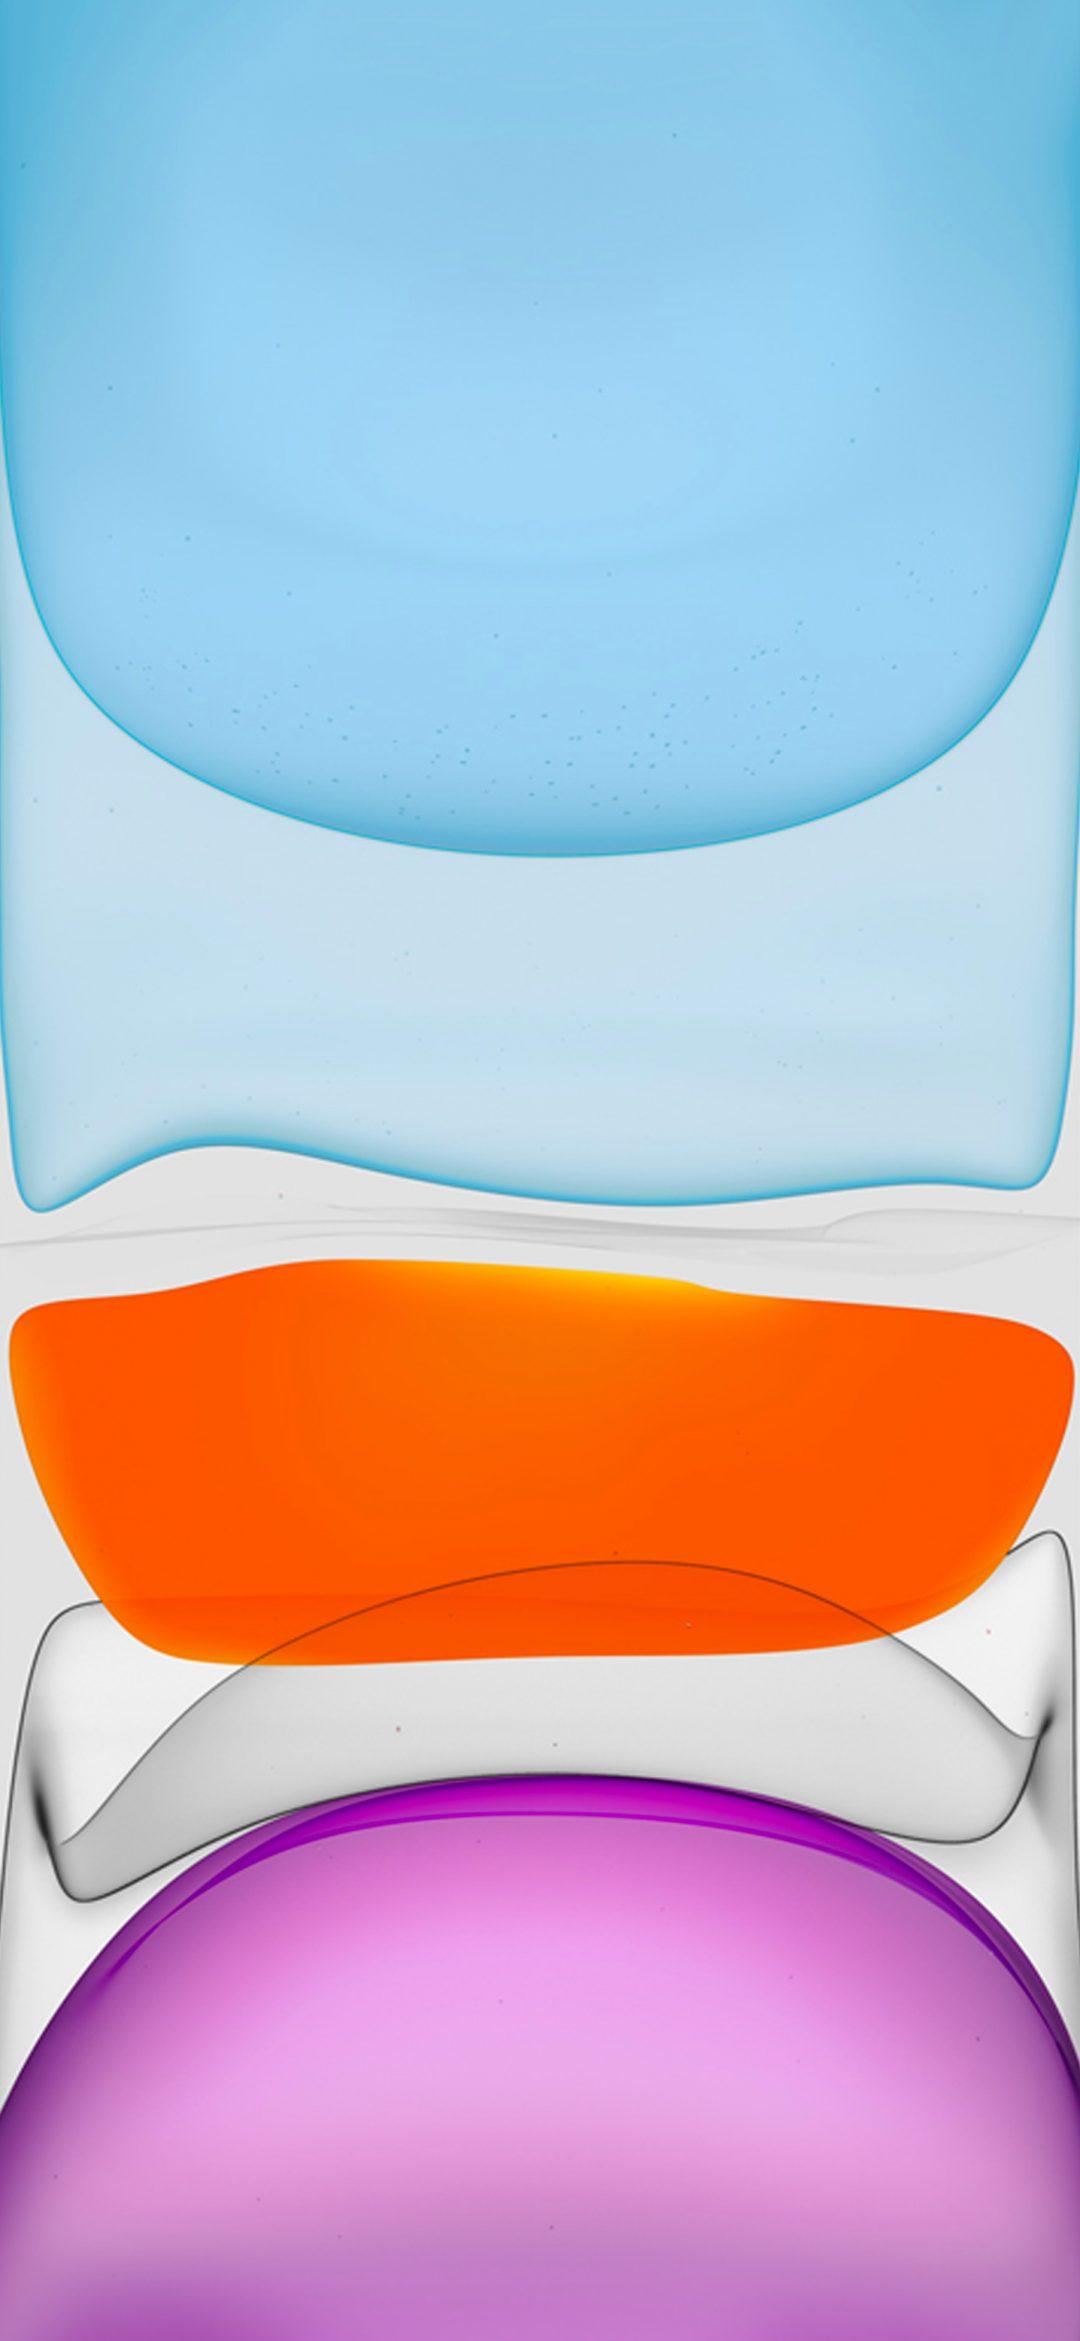 iphone-11-default-wallpaper-ardroiding-02